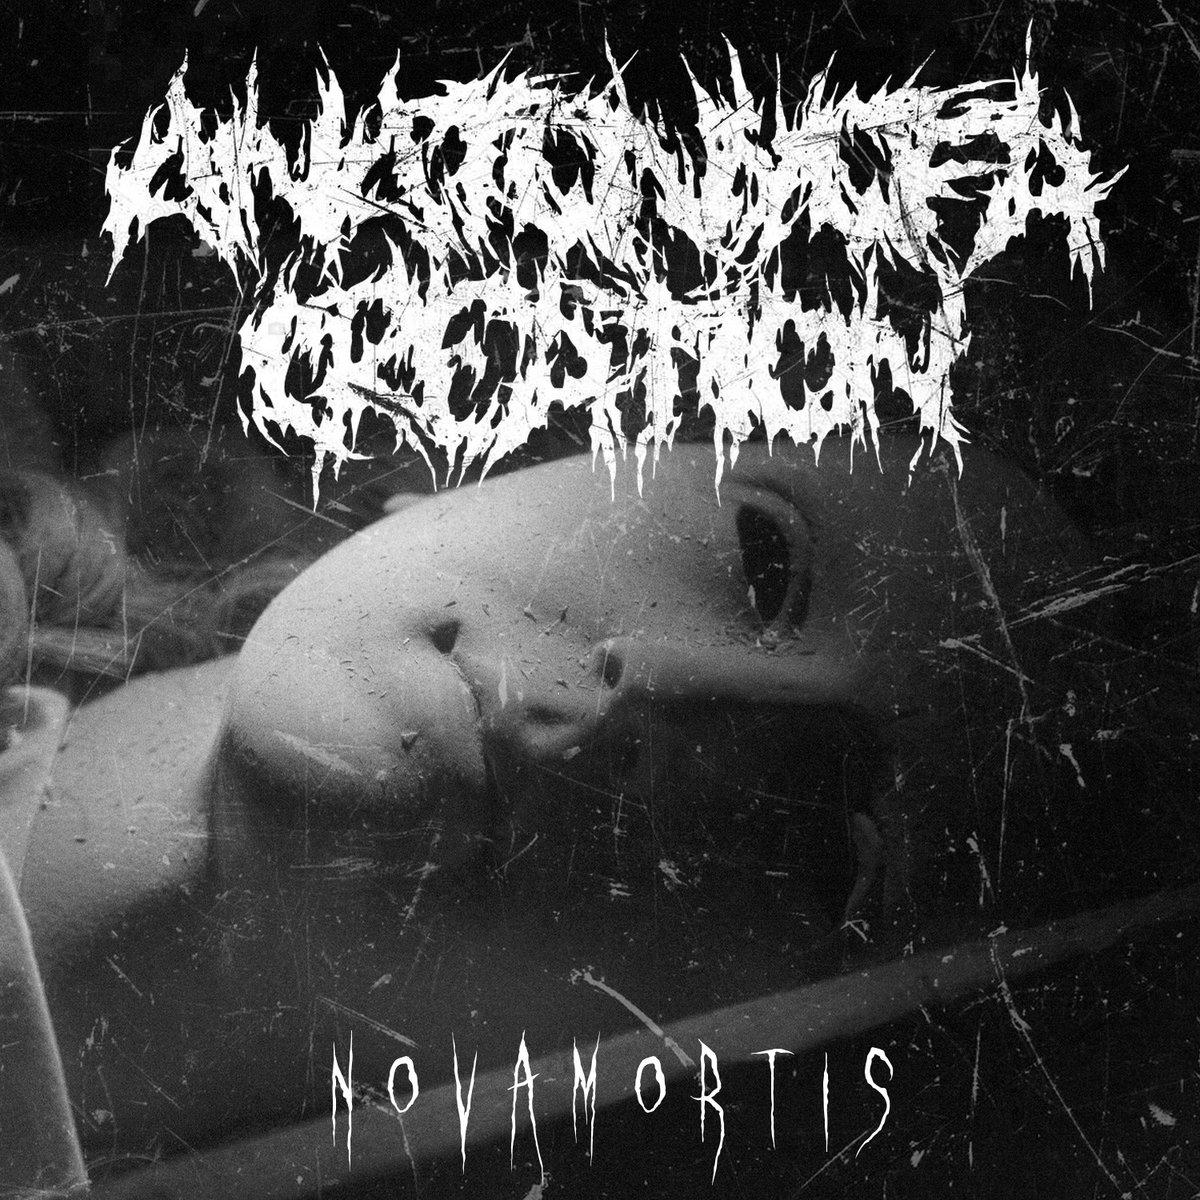 Nova Mortis | Anatomy of a Creation